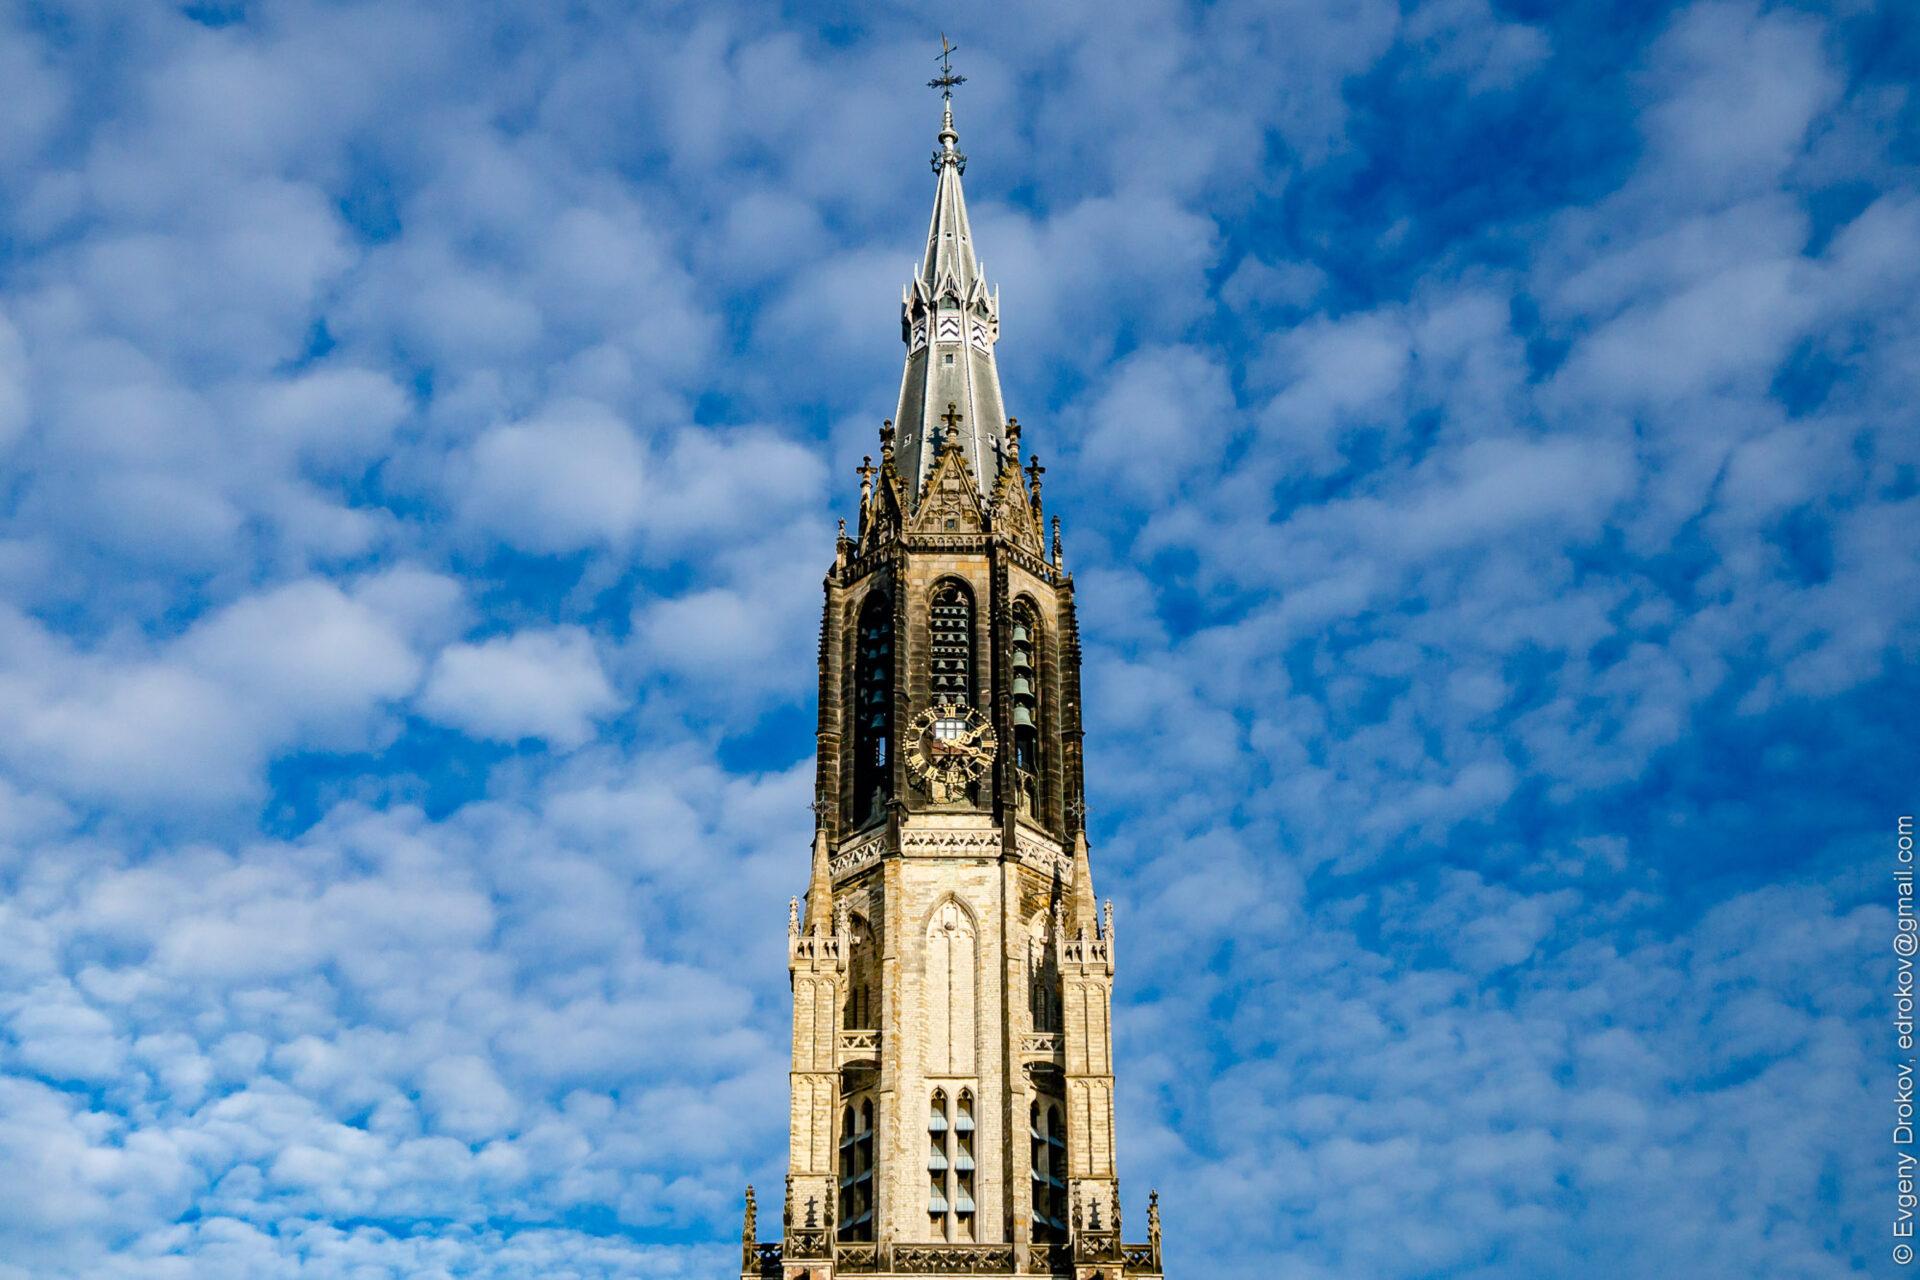 Провинция Южная Голландия / Zuid Holland